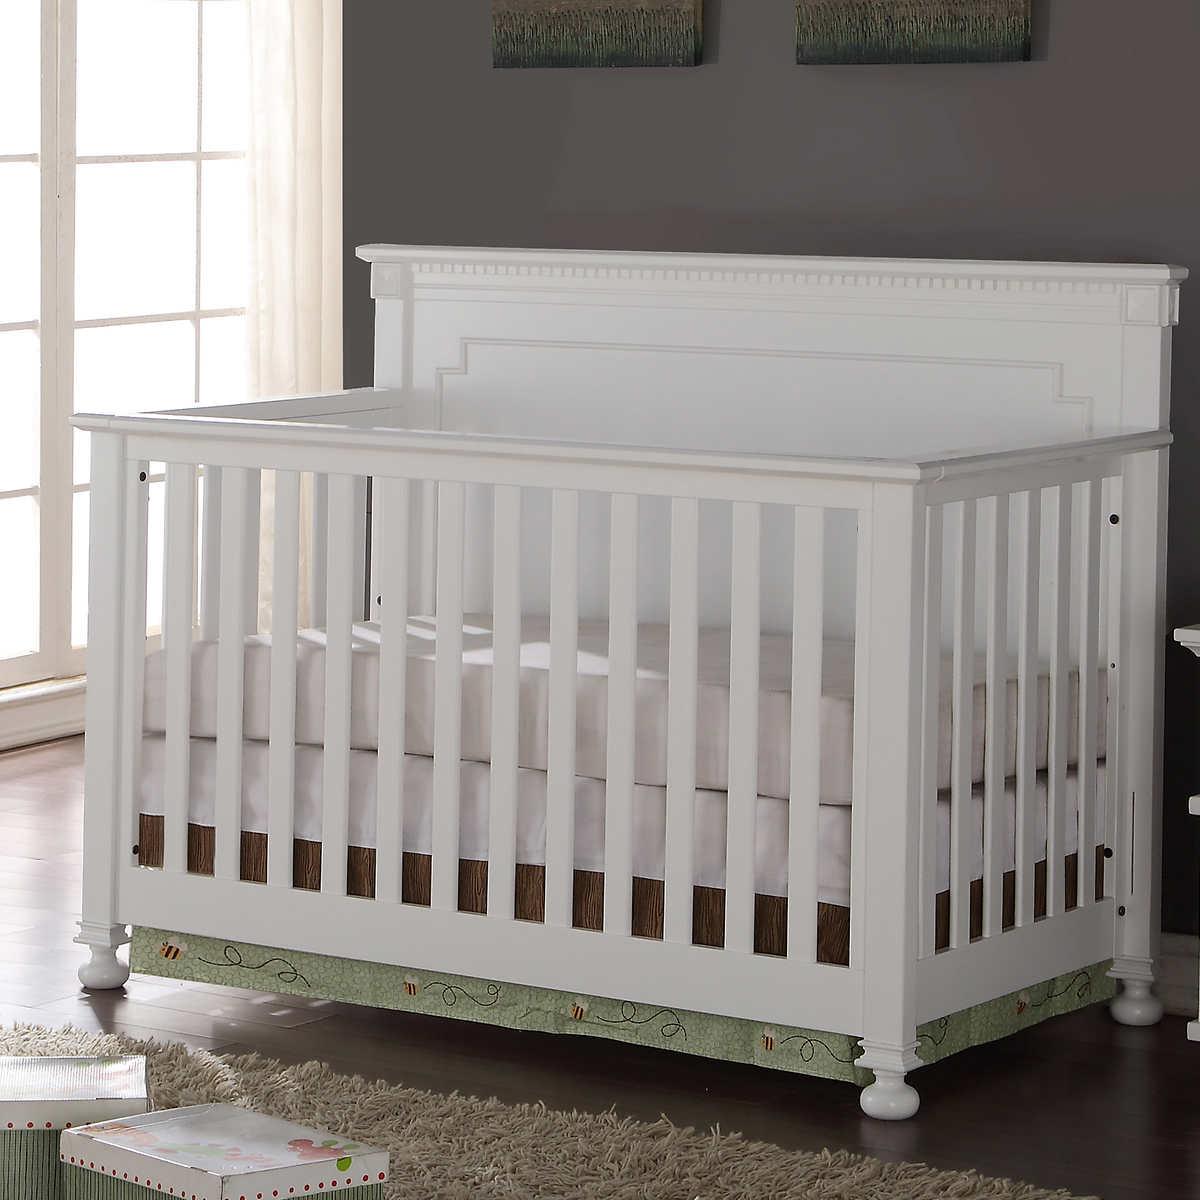 Baby crib for sale ottawa - Belgian 3 In 1 White Finish Crib